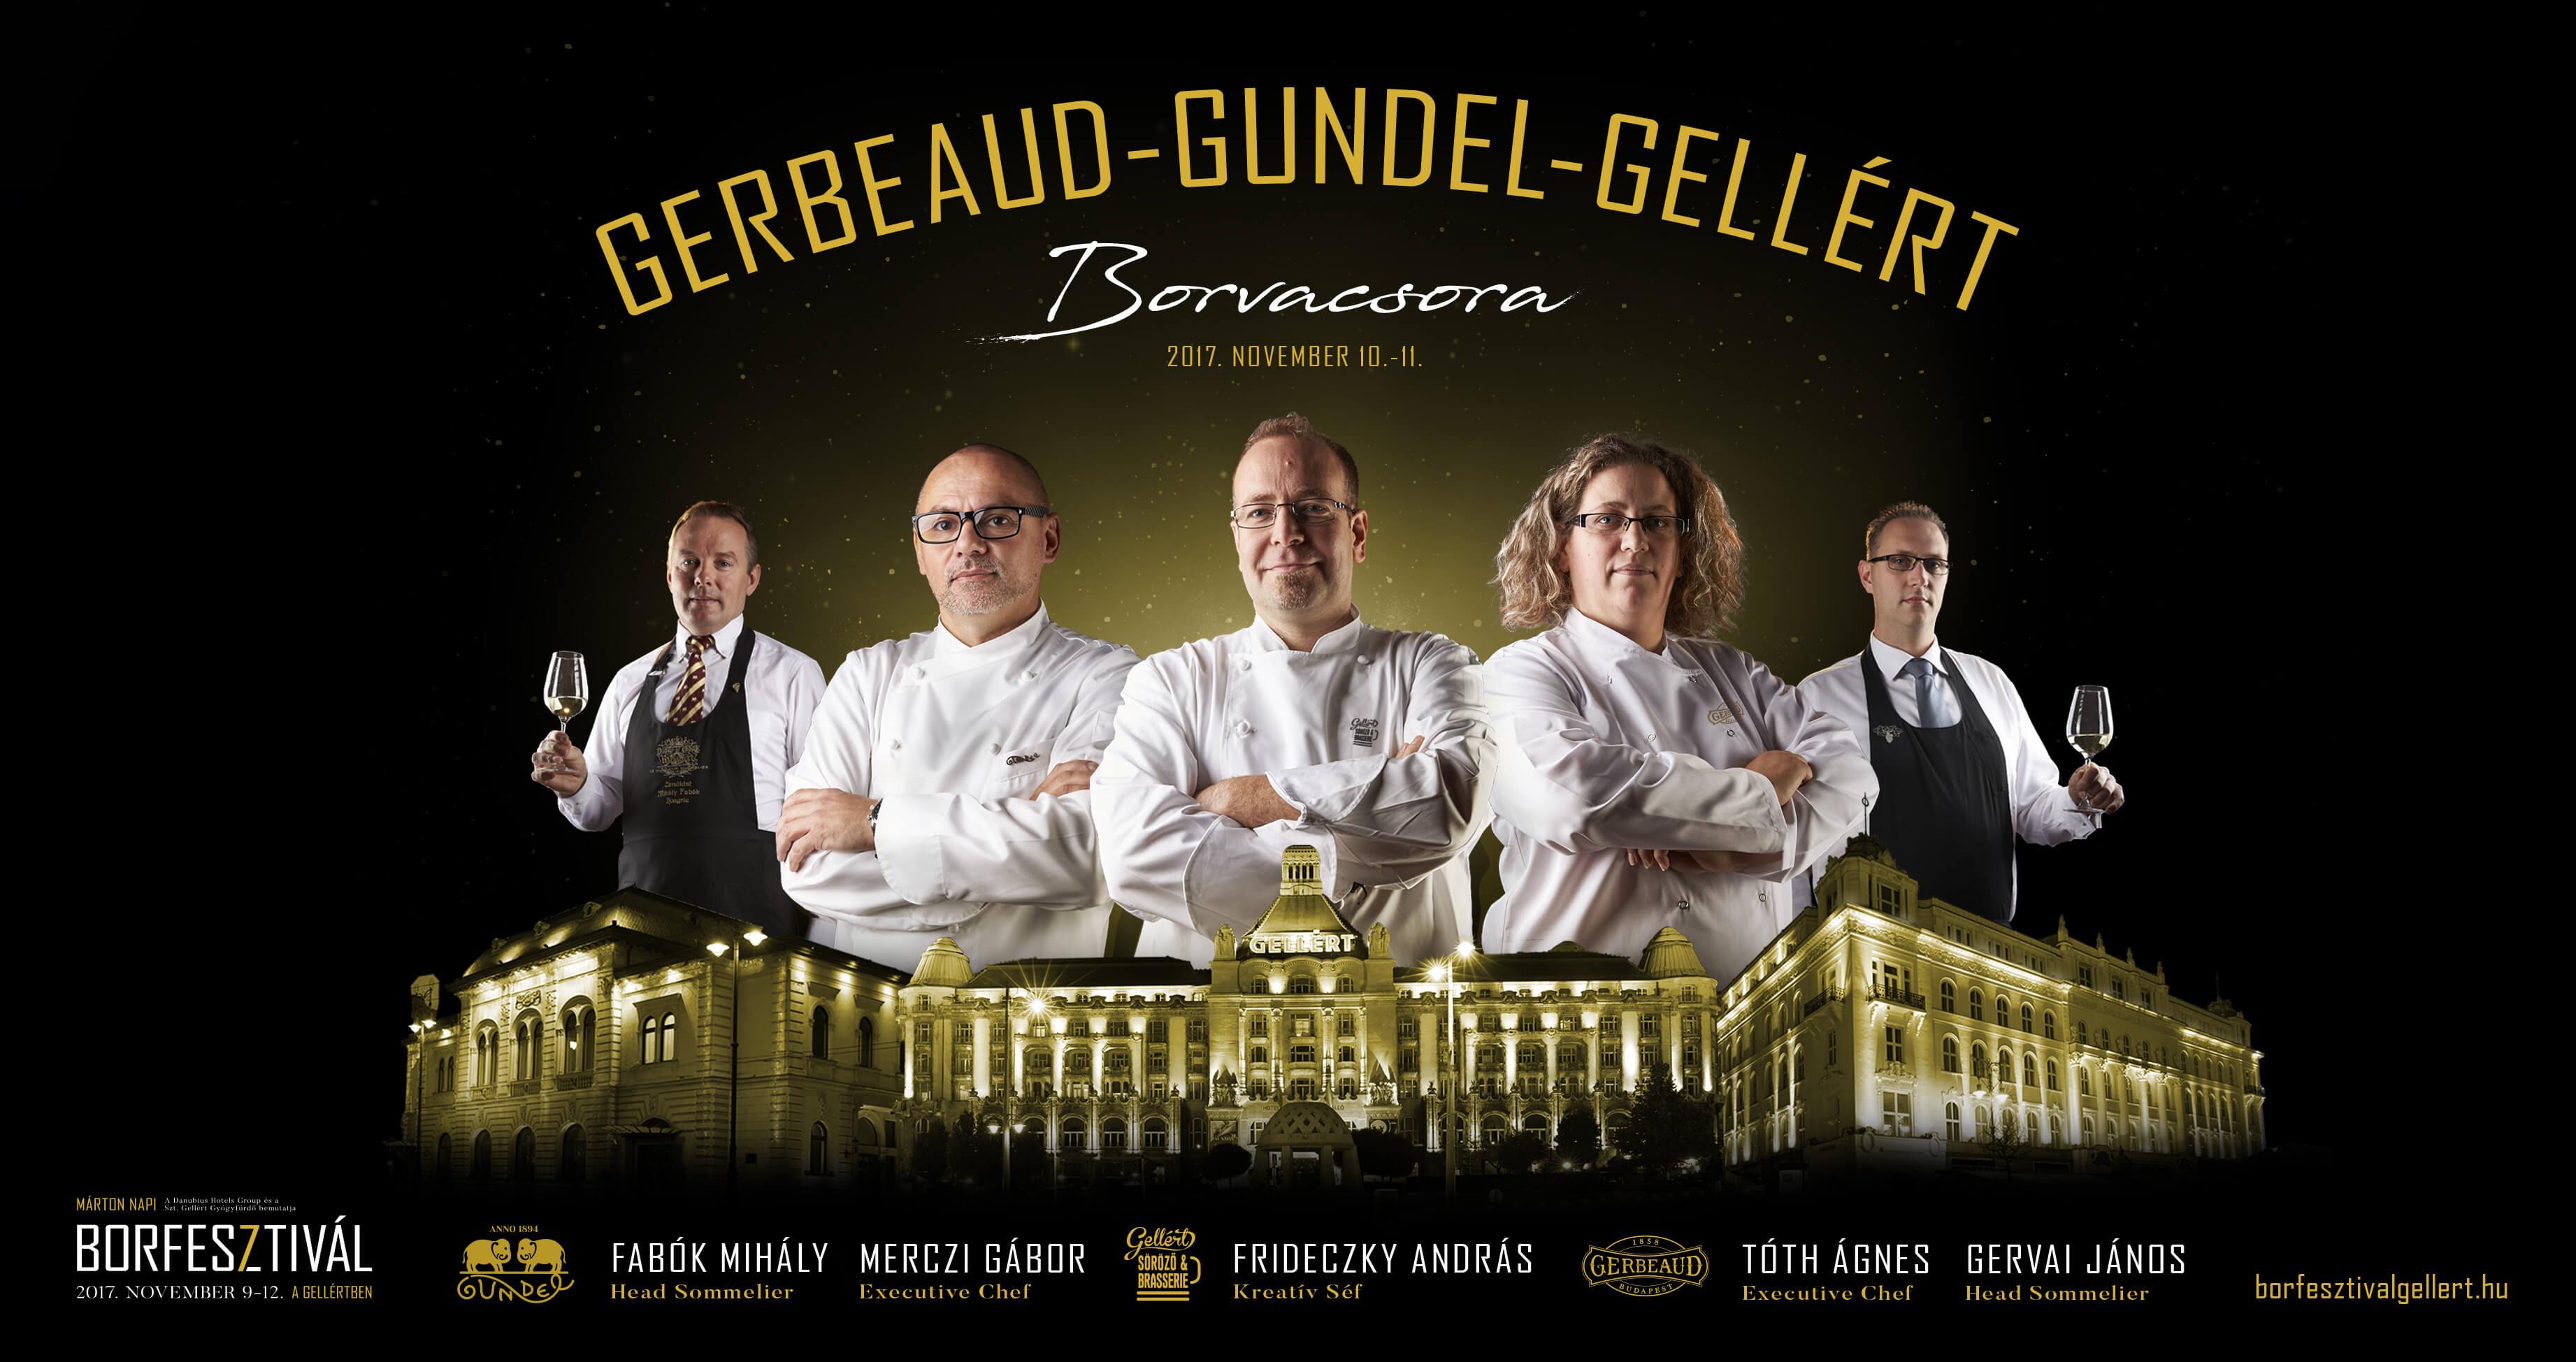 gerbeaud-gundel-gelle_rt-borvacsora_vii_ma_rton-napi-borfesztiva_l-a-gelle_rtben.jpg